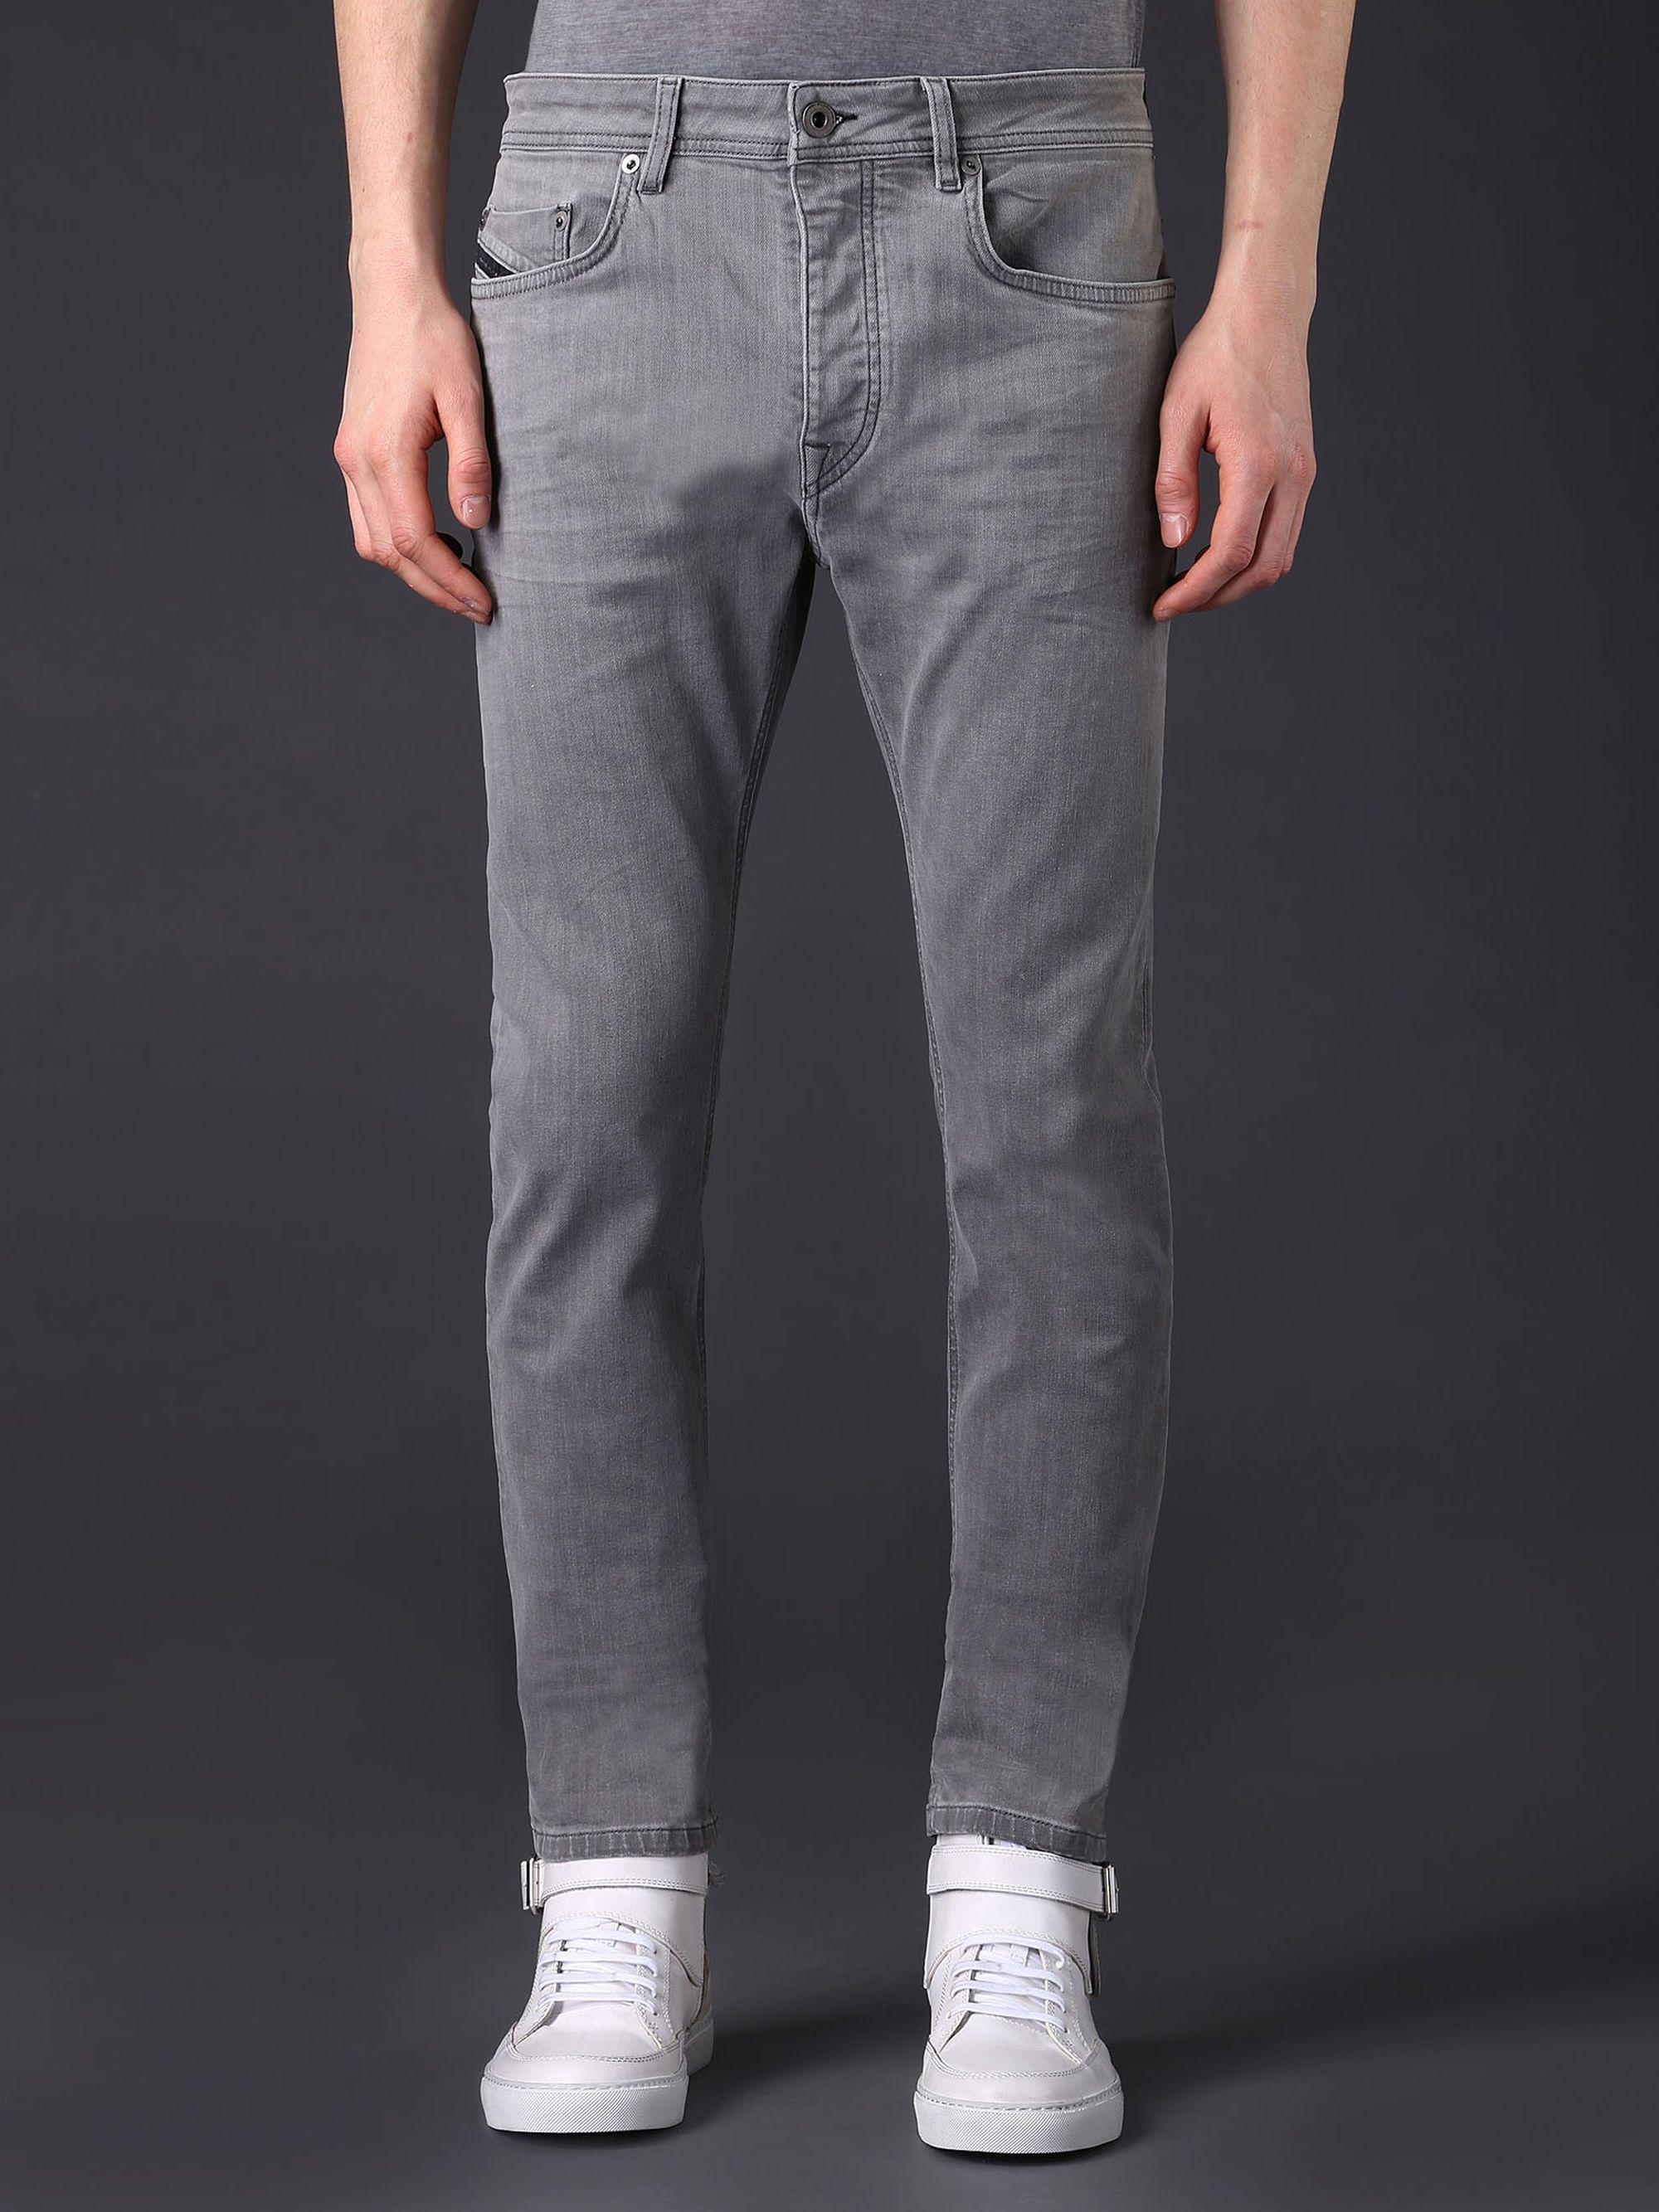 66db1e2dbac6 Diesel Black Gold TYPE-2512 Stretch Denim Jeans in Grey Jeans from the  Diesel Online Store  DieselBlackGold  TYPE2512  DieselOnlineStore